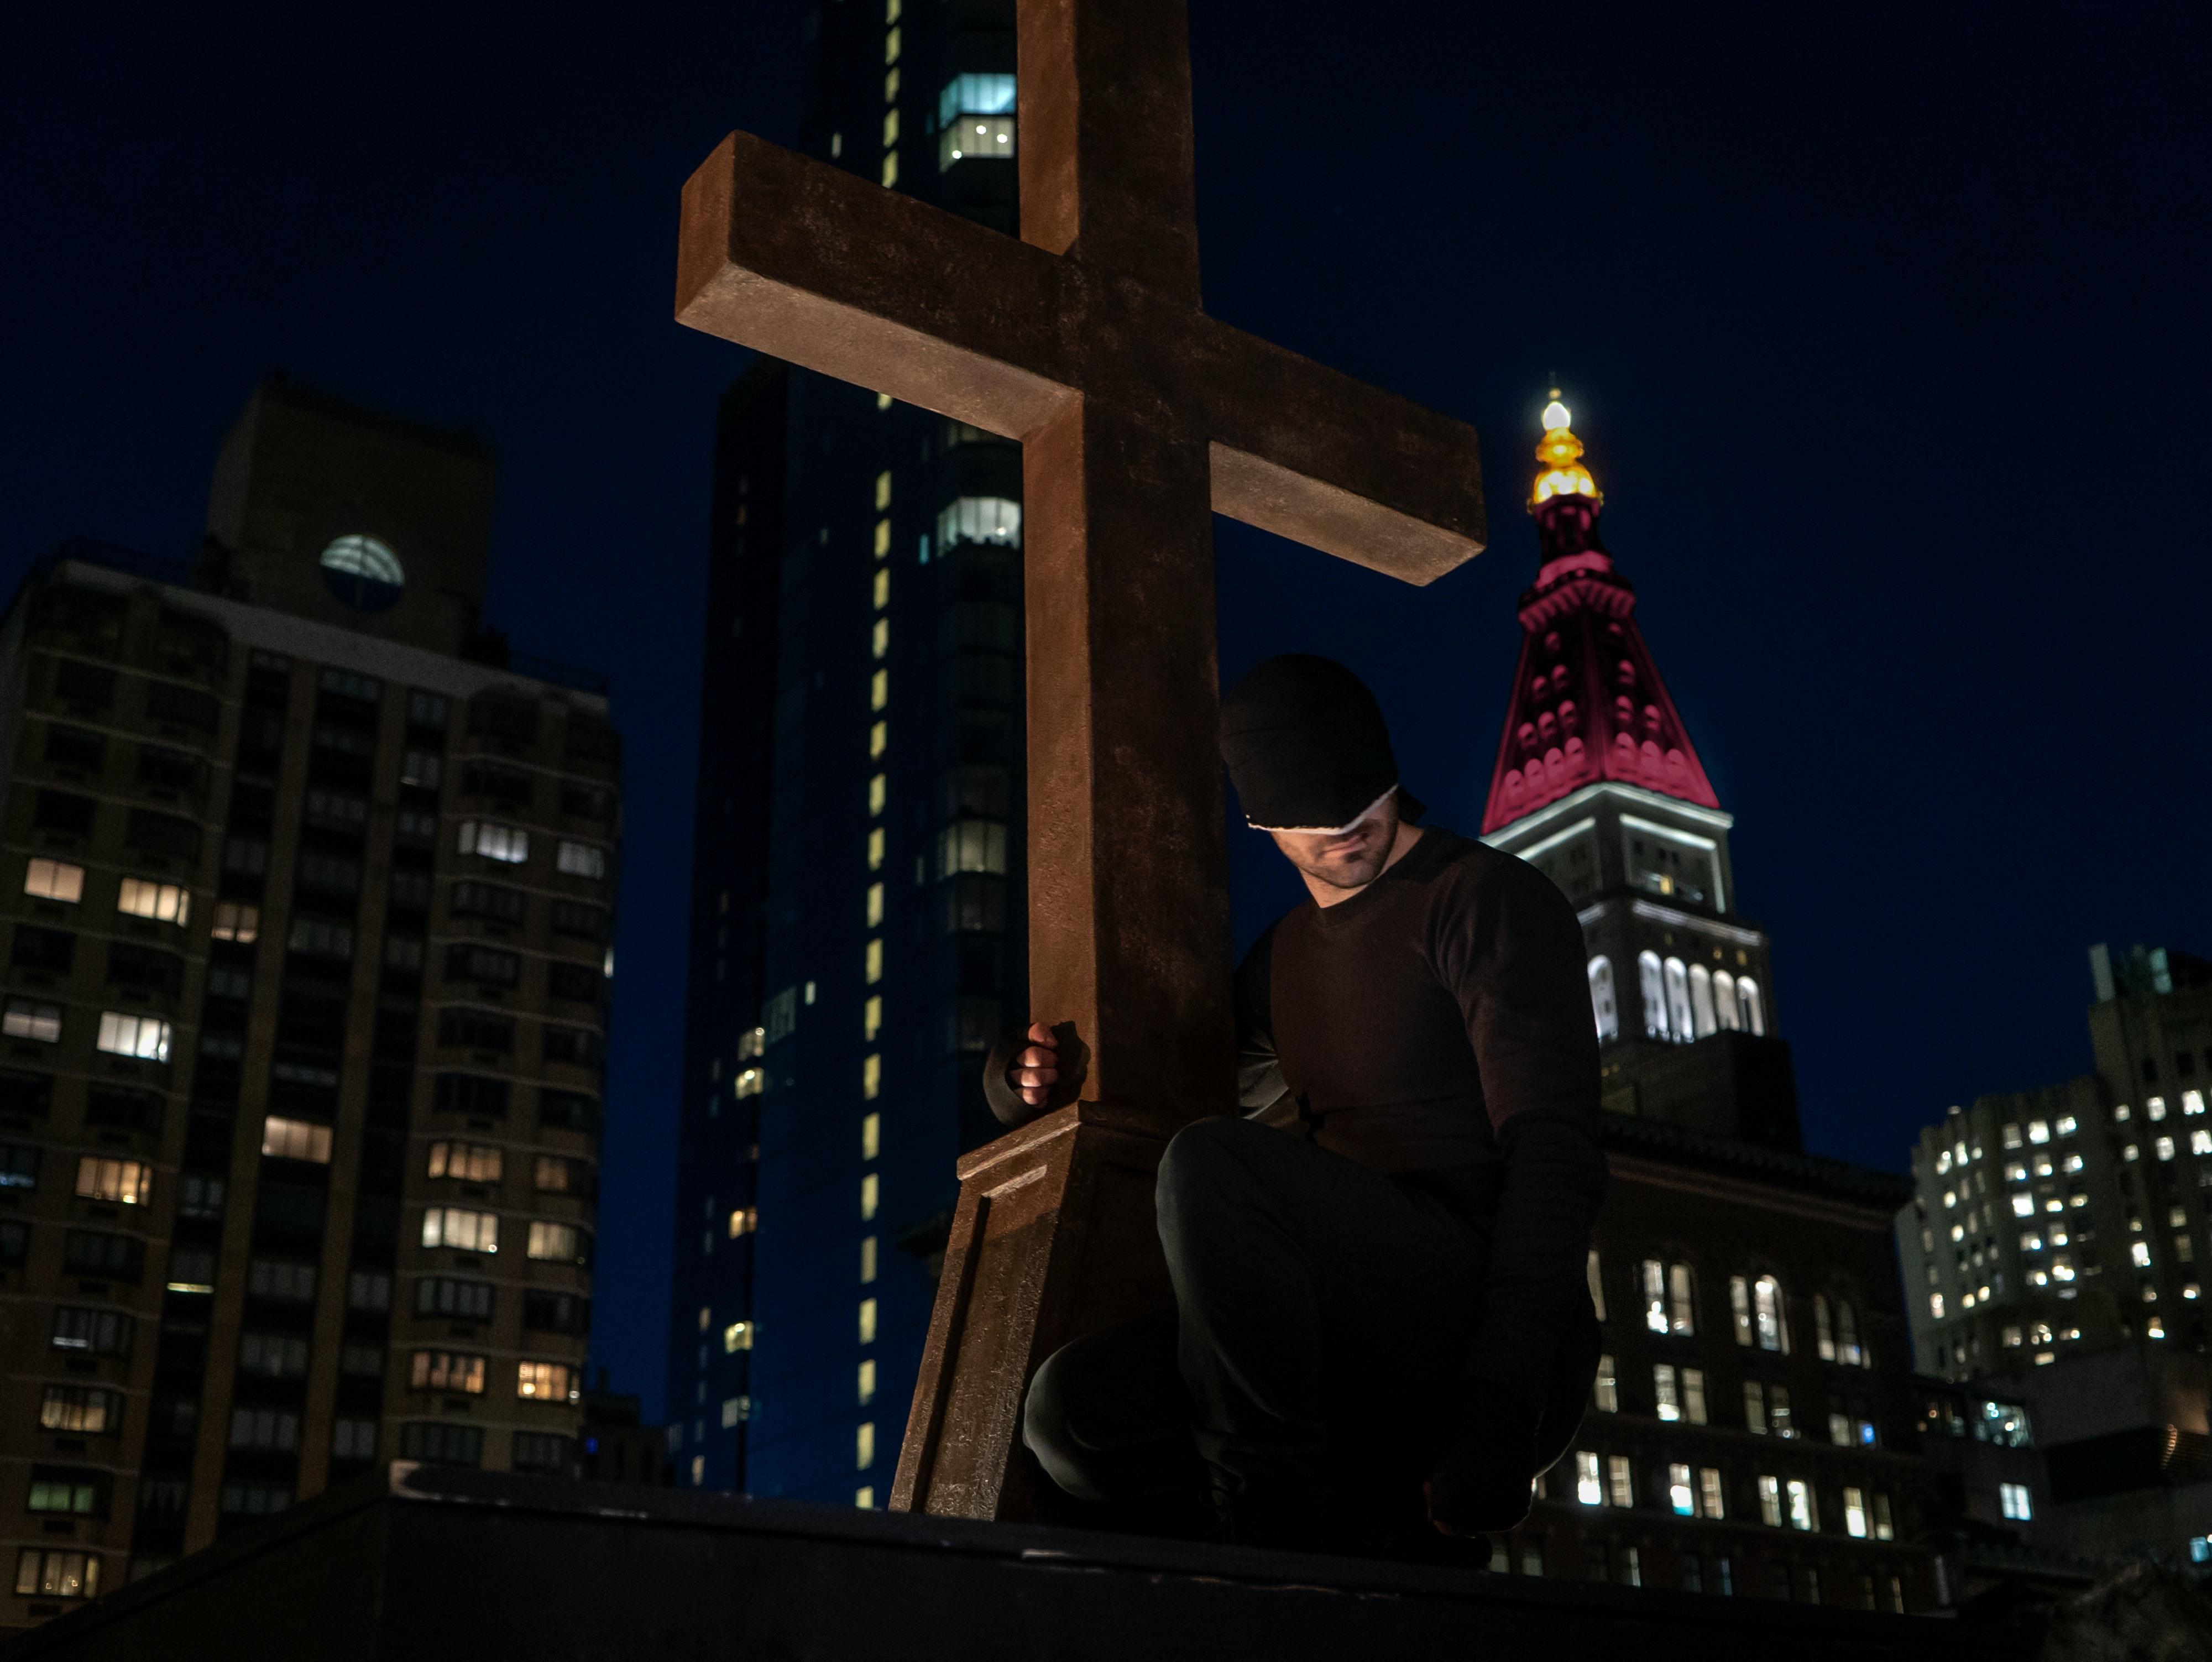 'Daredevil' Season 3 Abandons Marvel's Cinematic Universe, for the Better